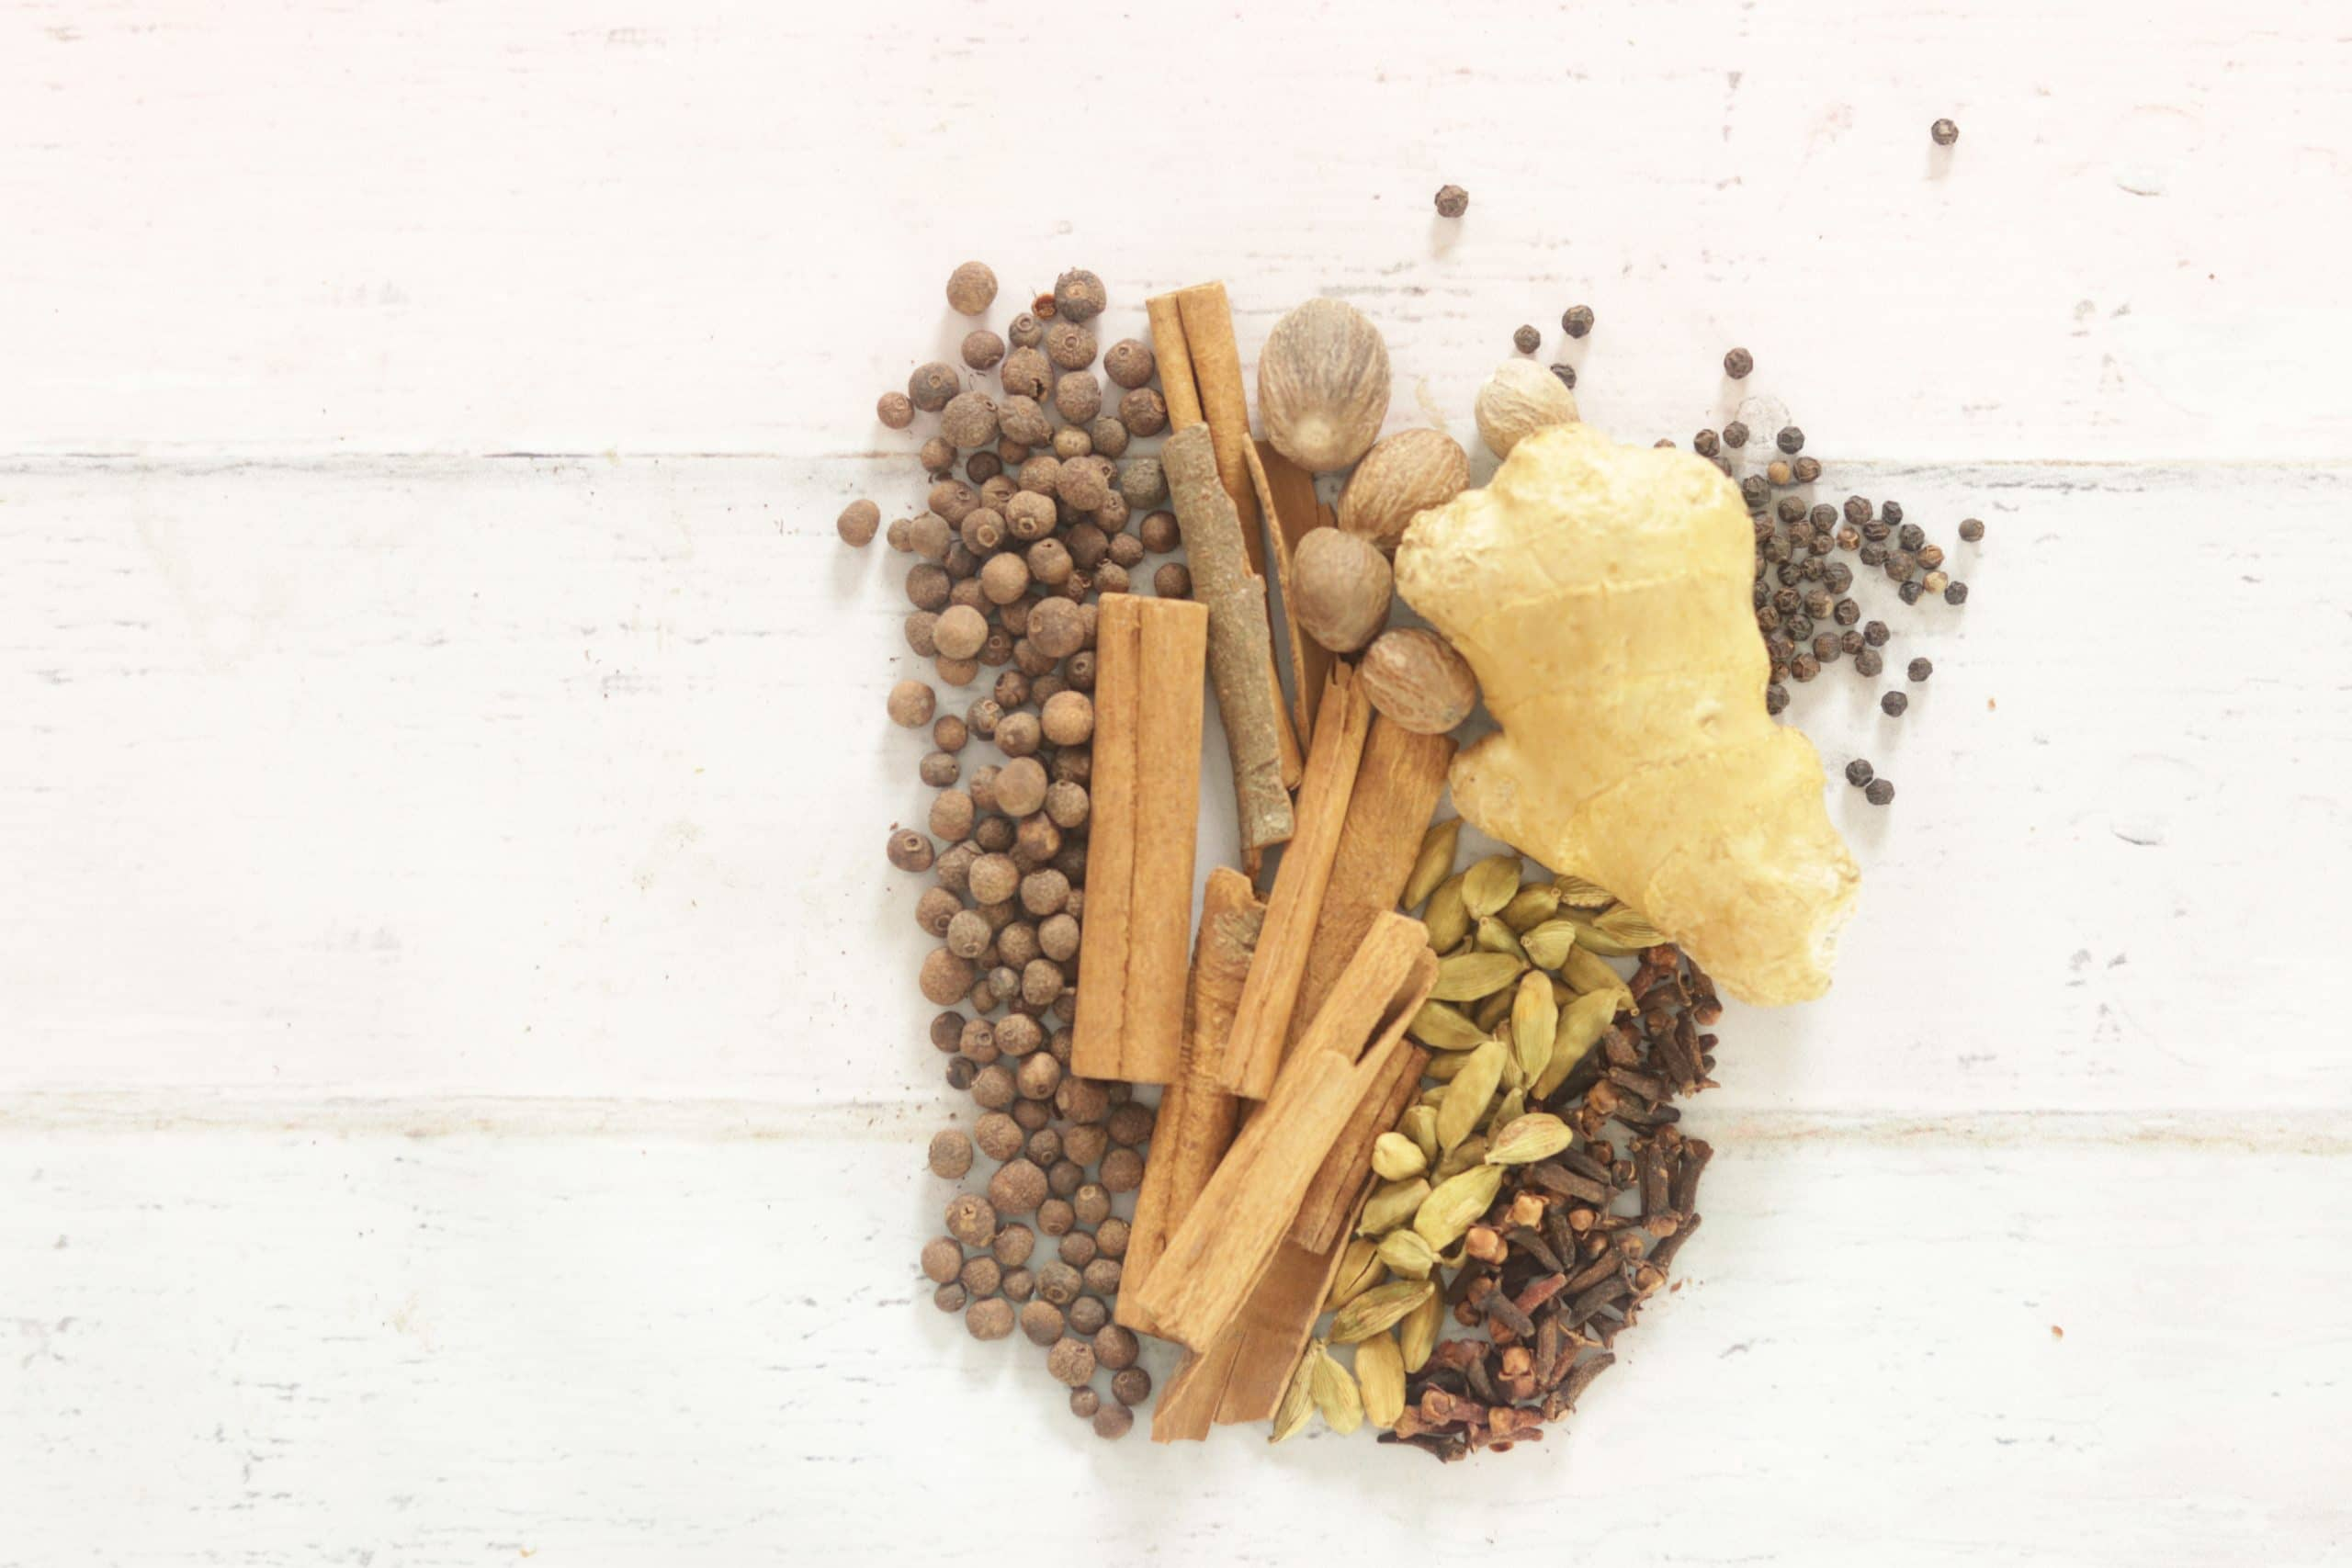 Pumpkin Pie Spice Ingredients - whole spices